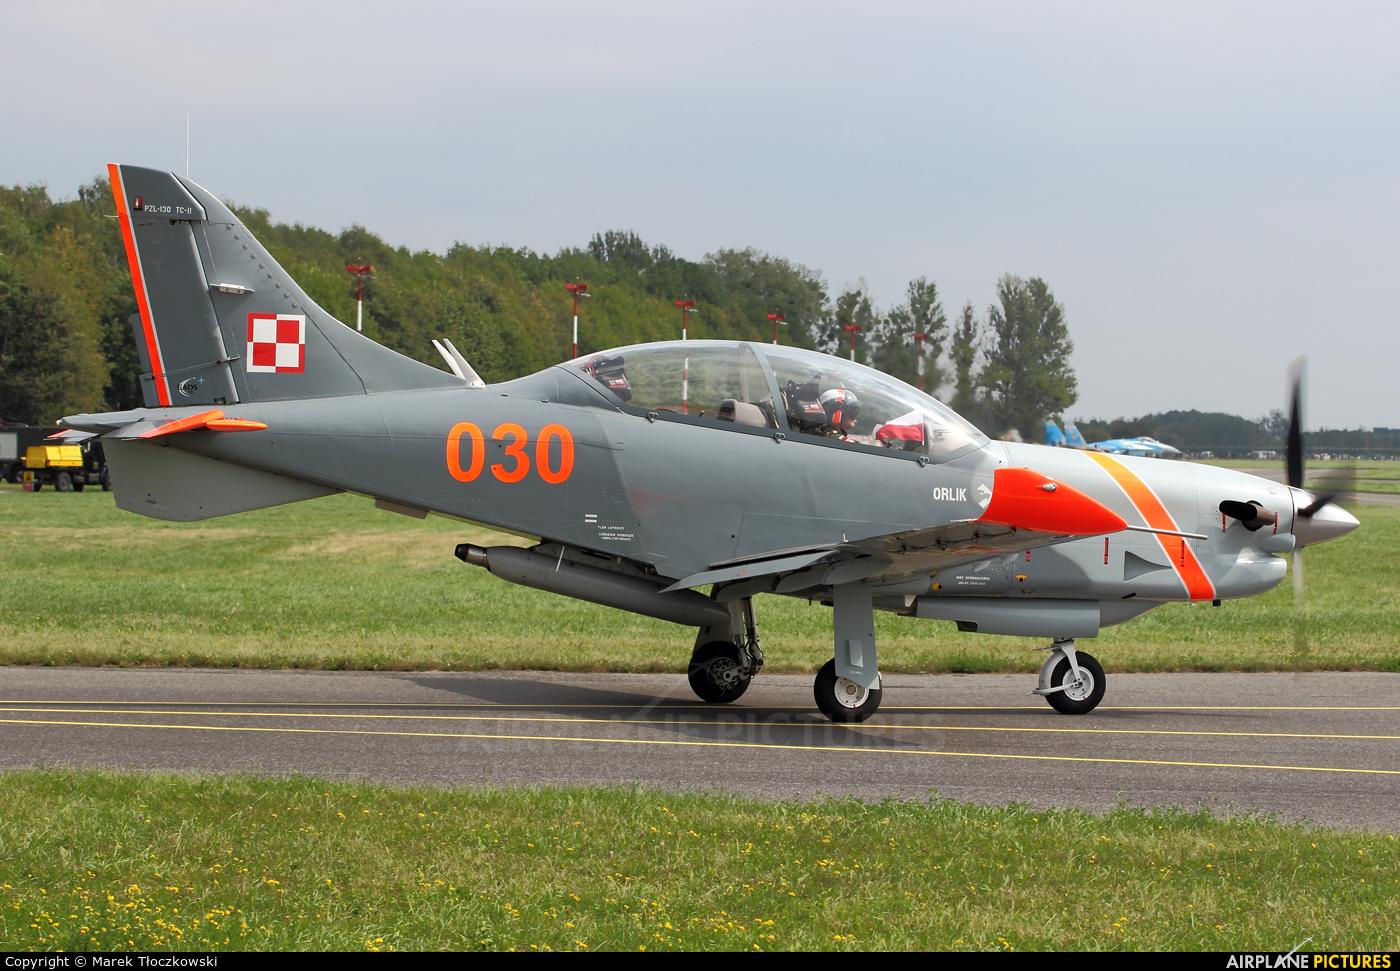 "Poland - Air Force ""Orlik Acrobatic Group"" 030 aircraft at Radom - Sadków"